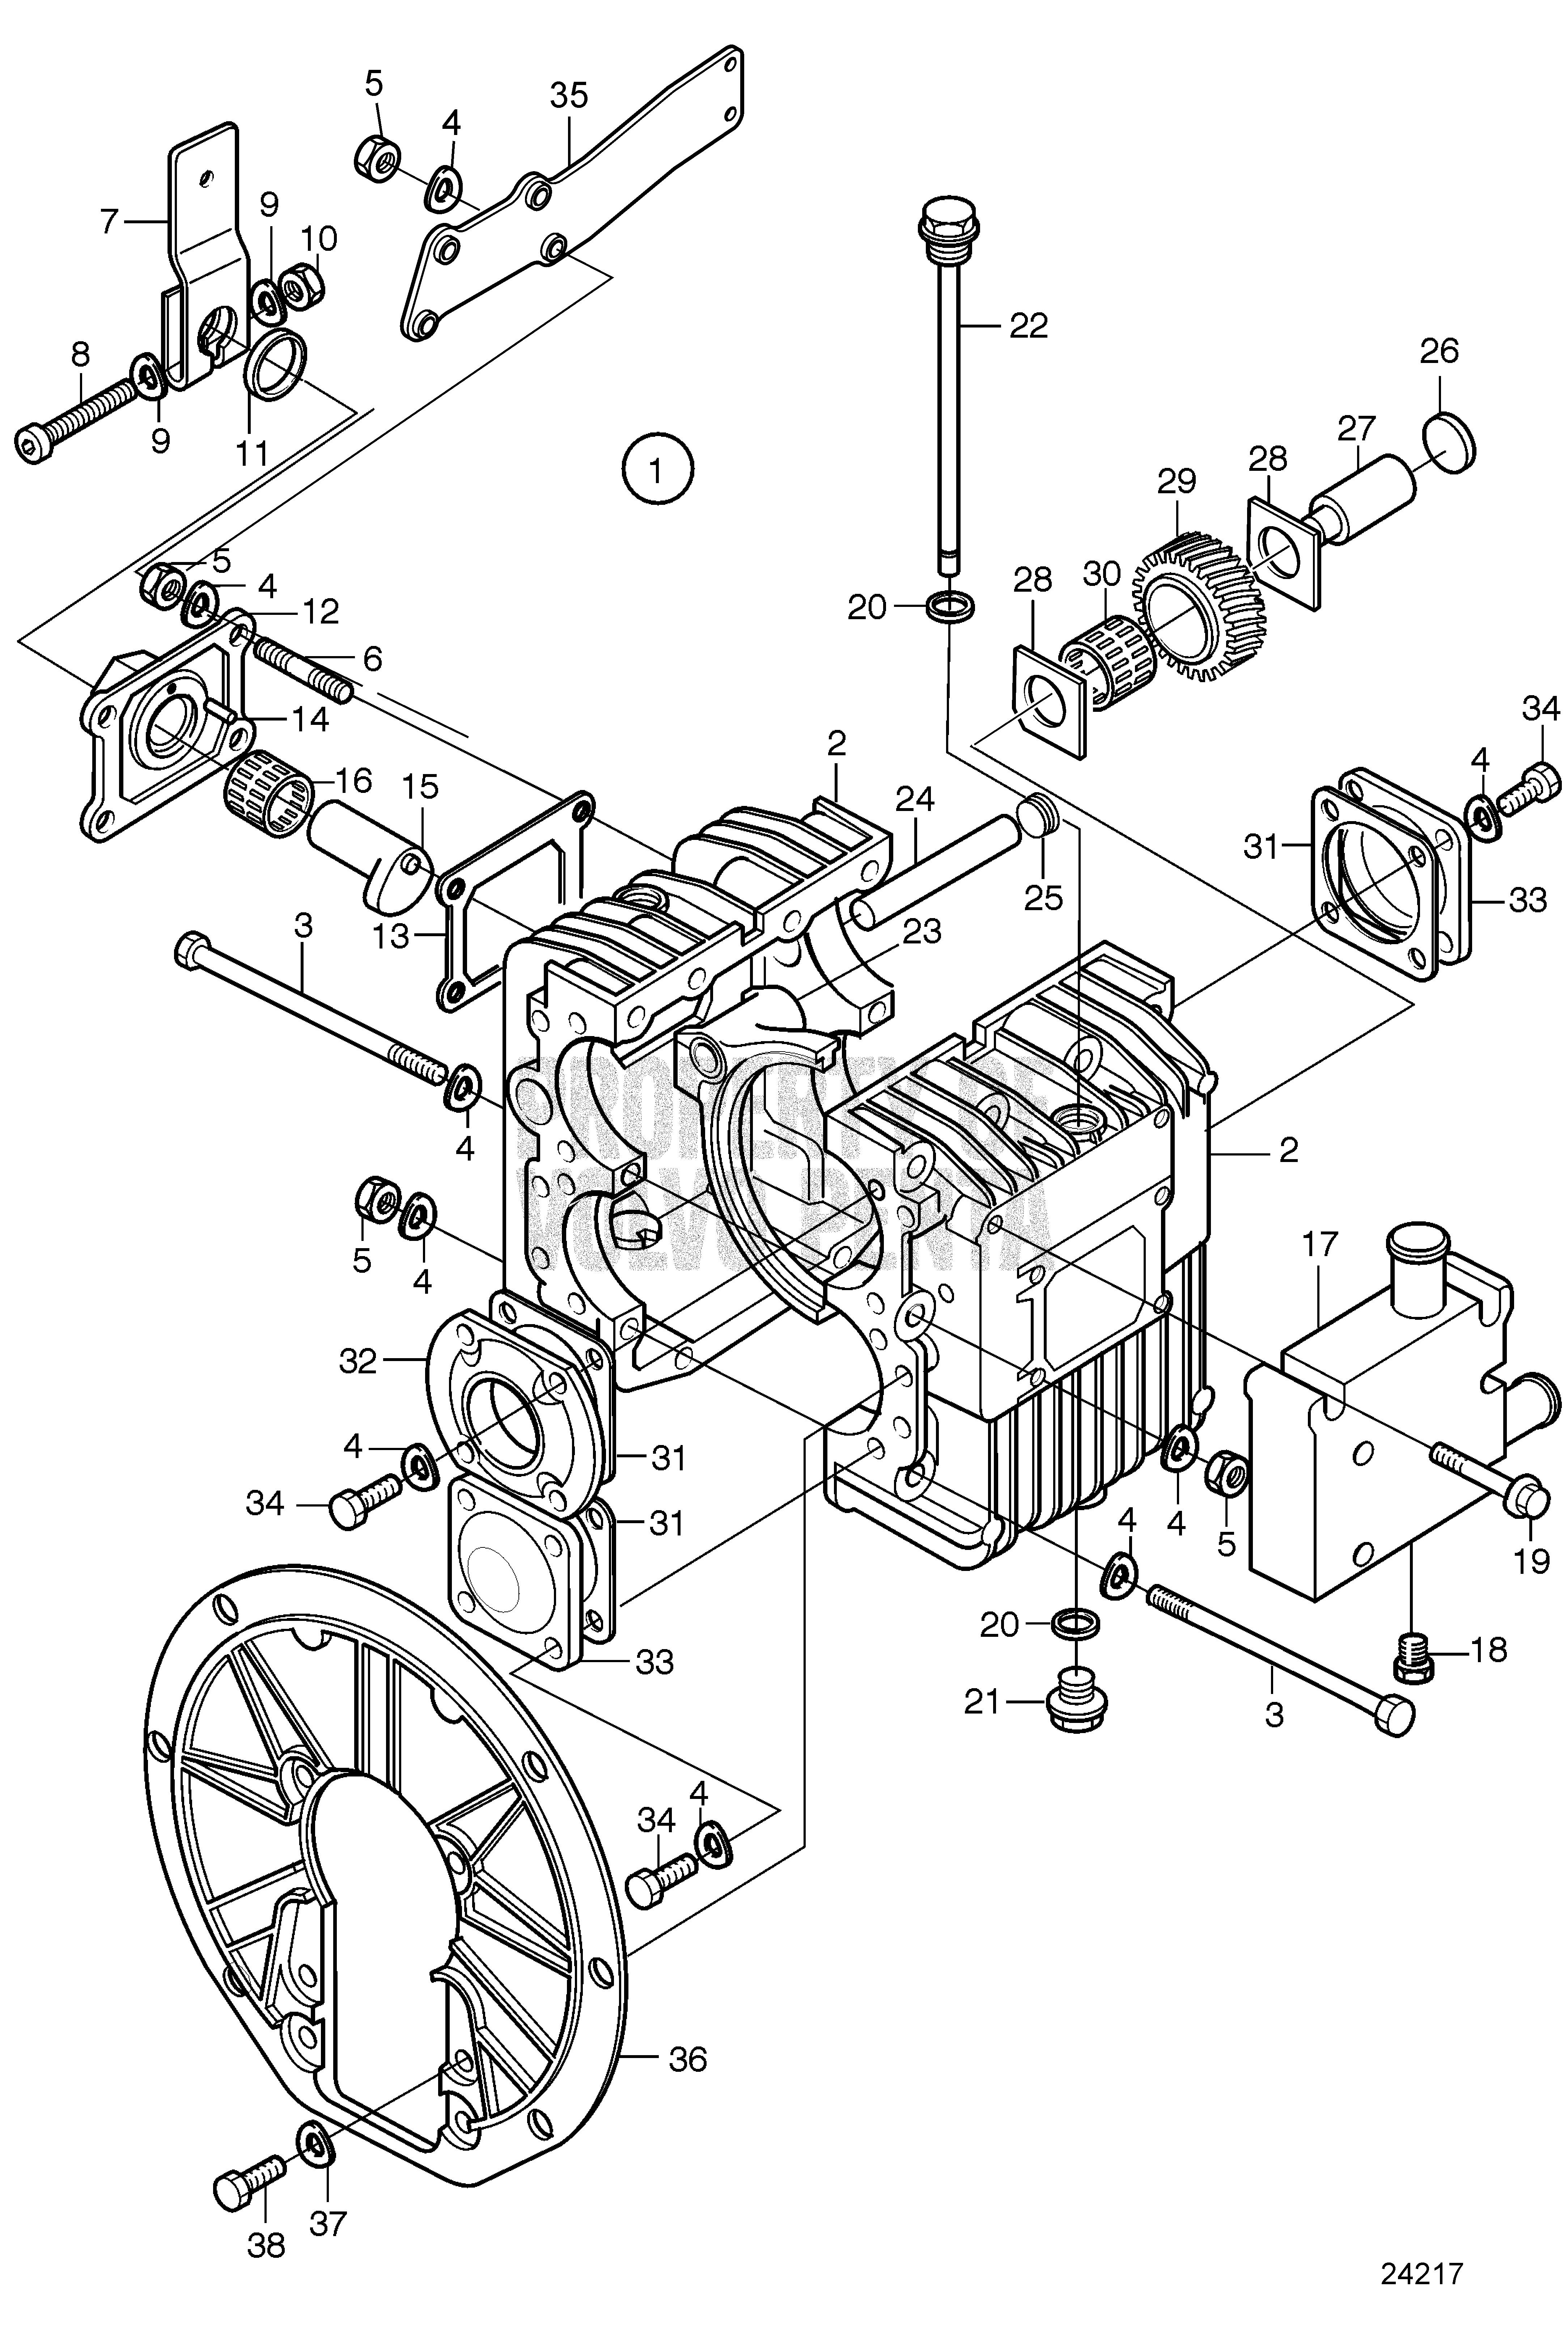 carburetor conversion volvo parts w does manifold apply itm not marine penta weber